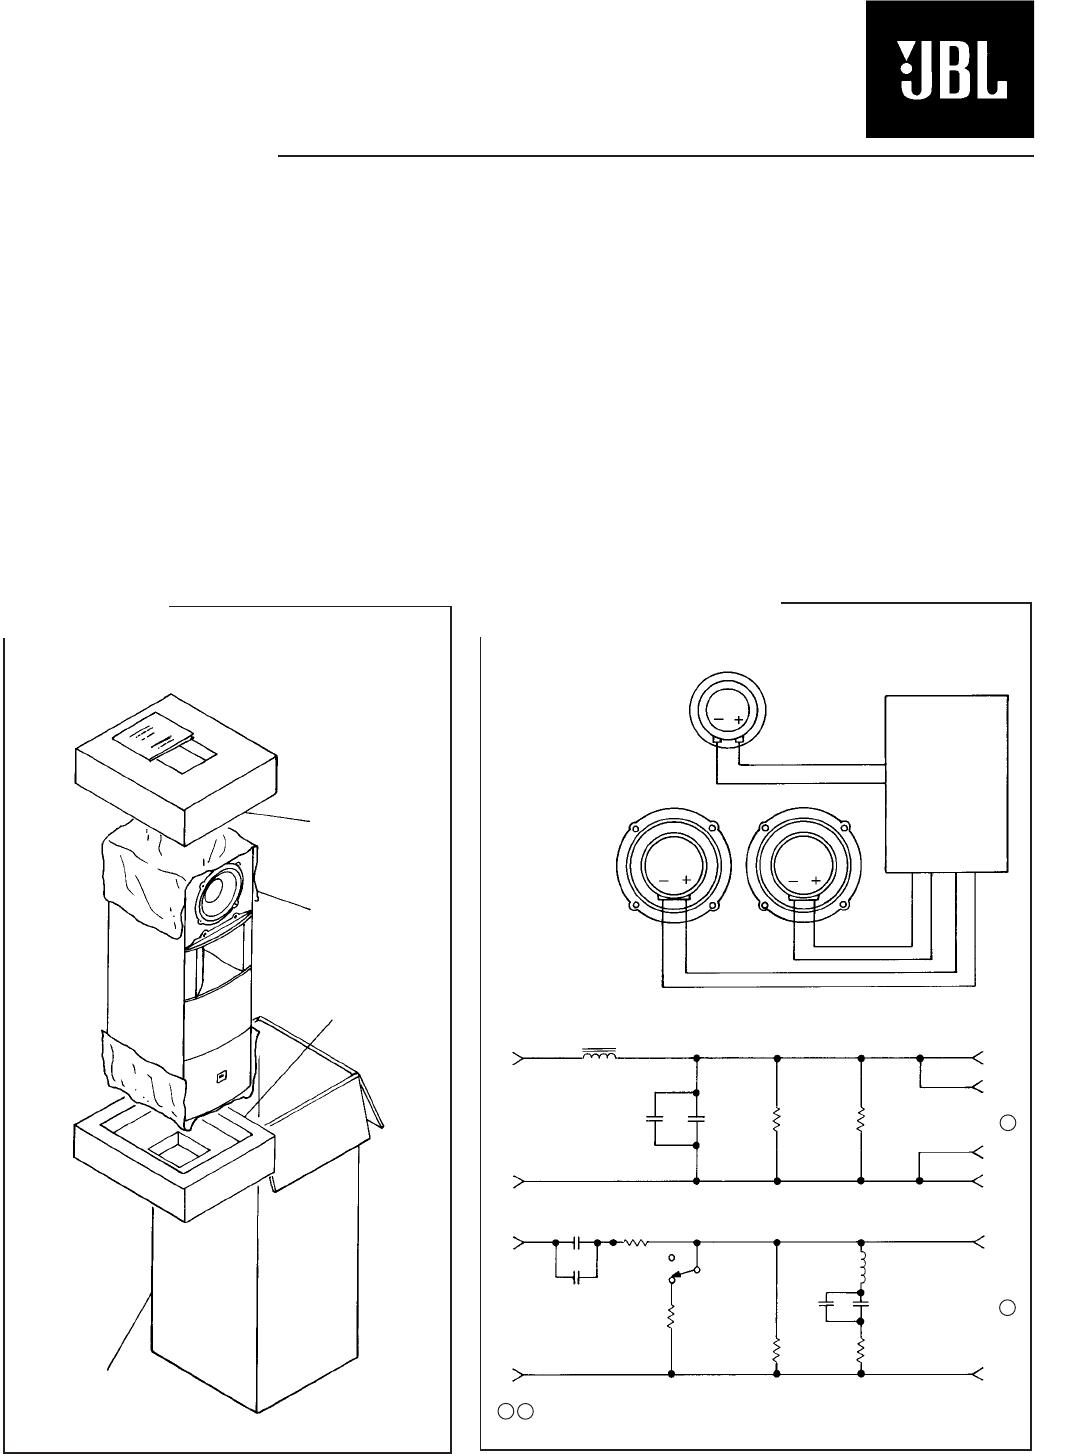 Jbl Sva1600 Nyjbl User Manual To The 1ec2a87d E044 45b4